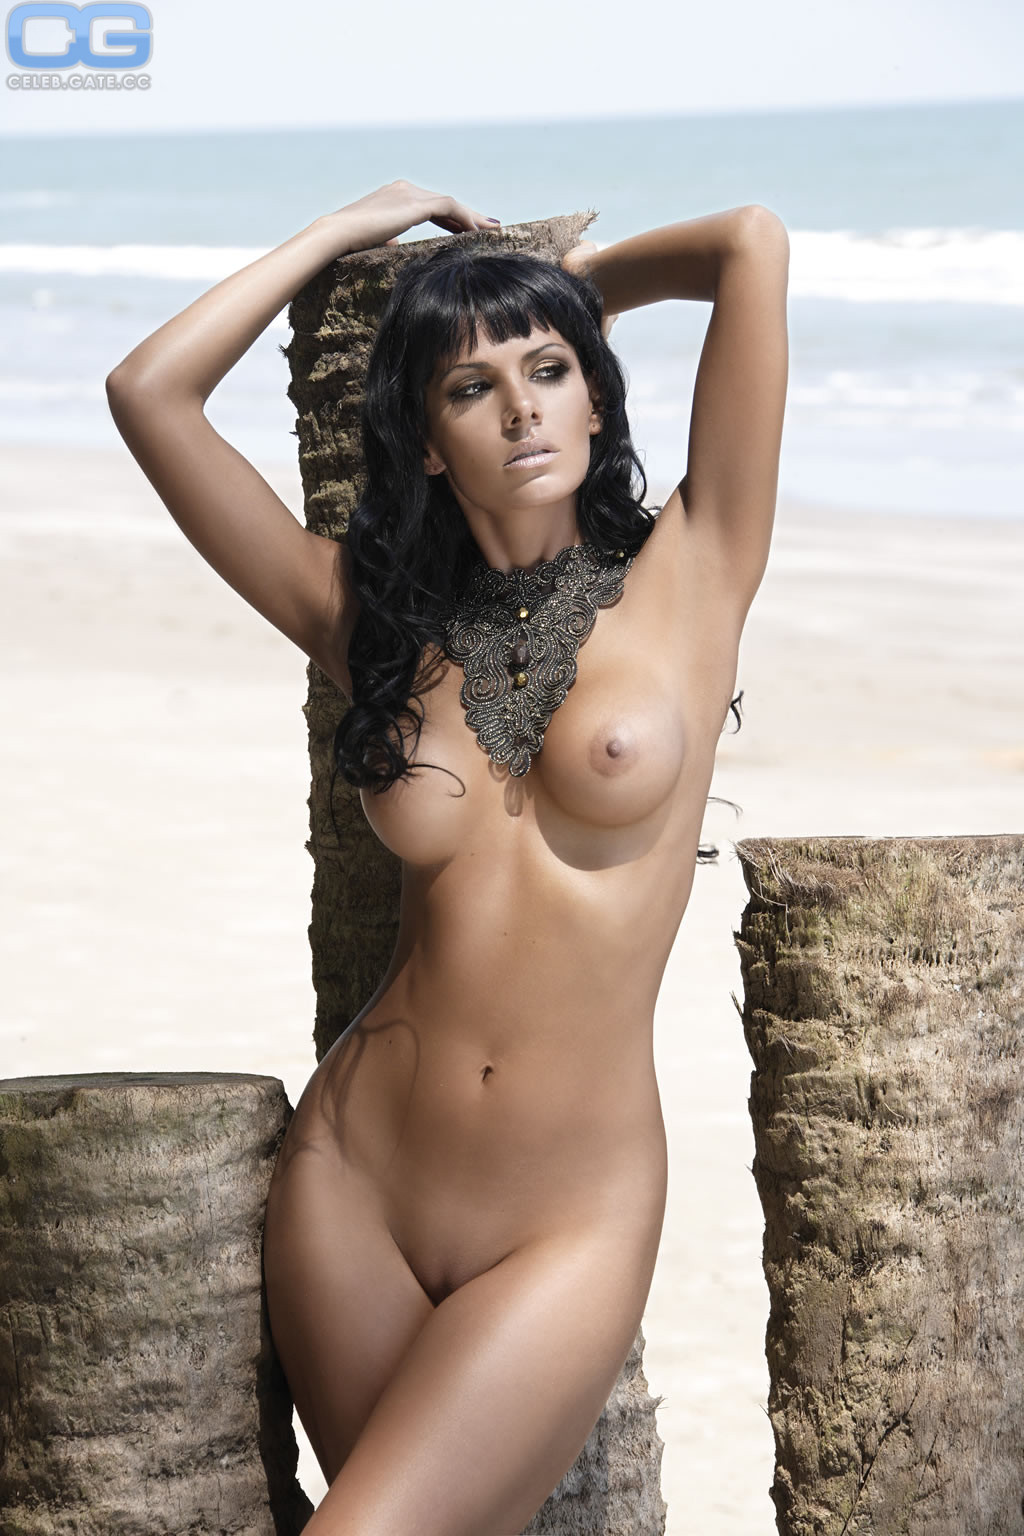 Vanessa arias nude in playboy